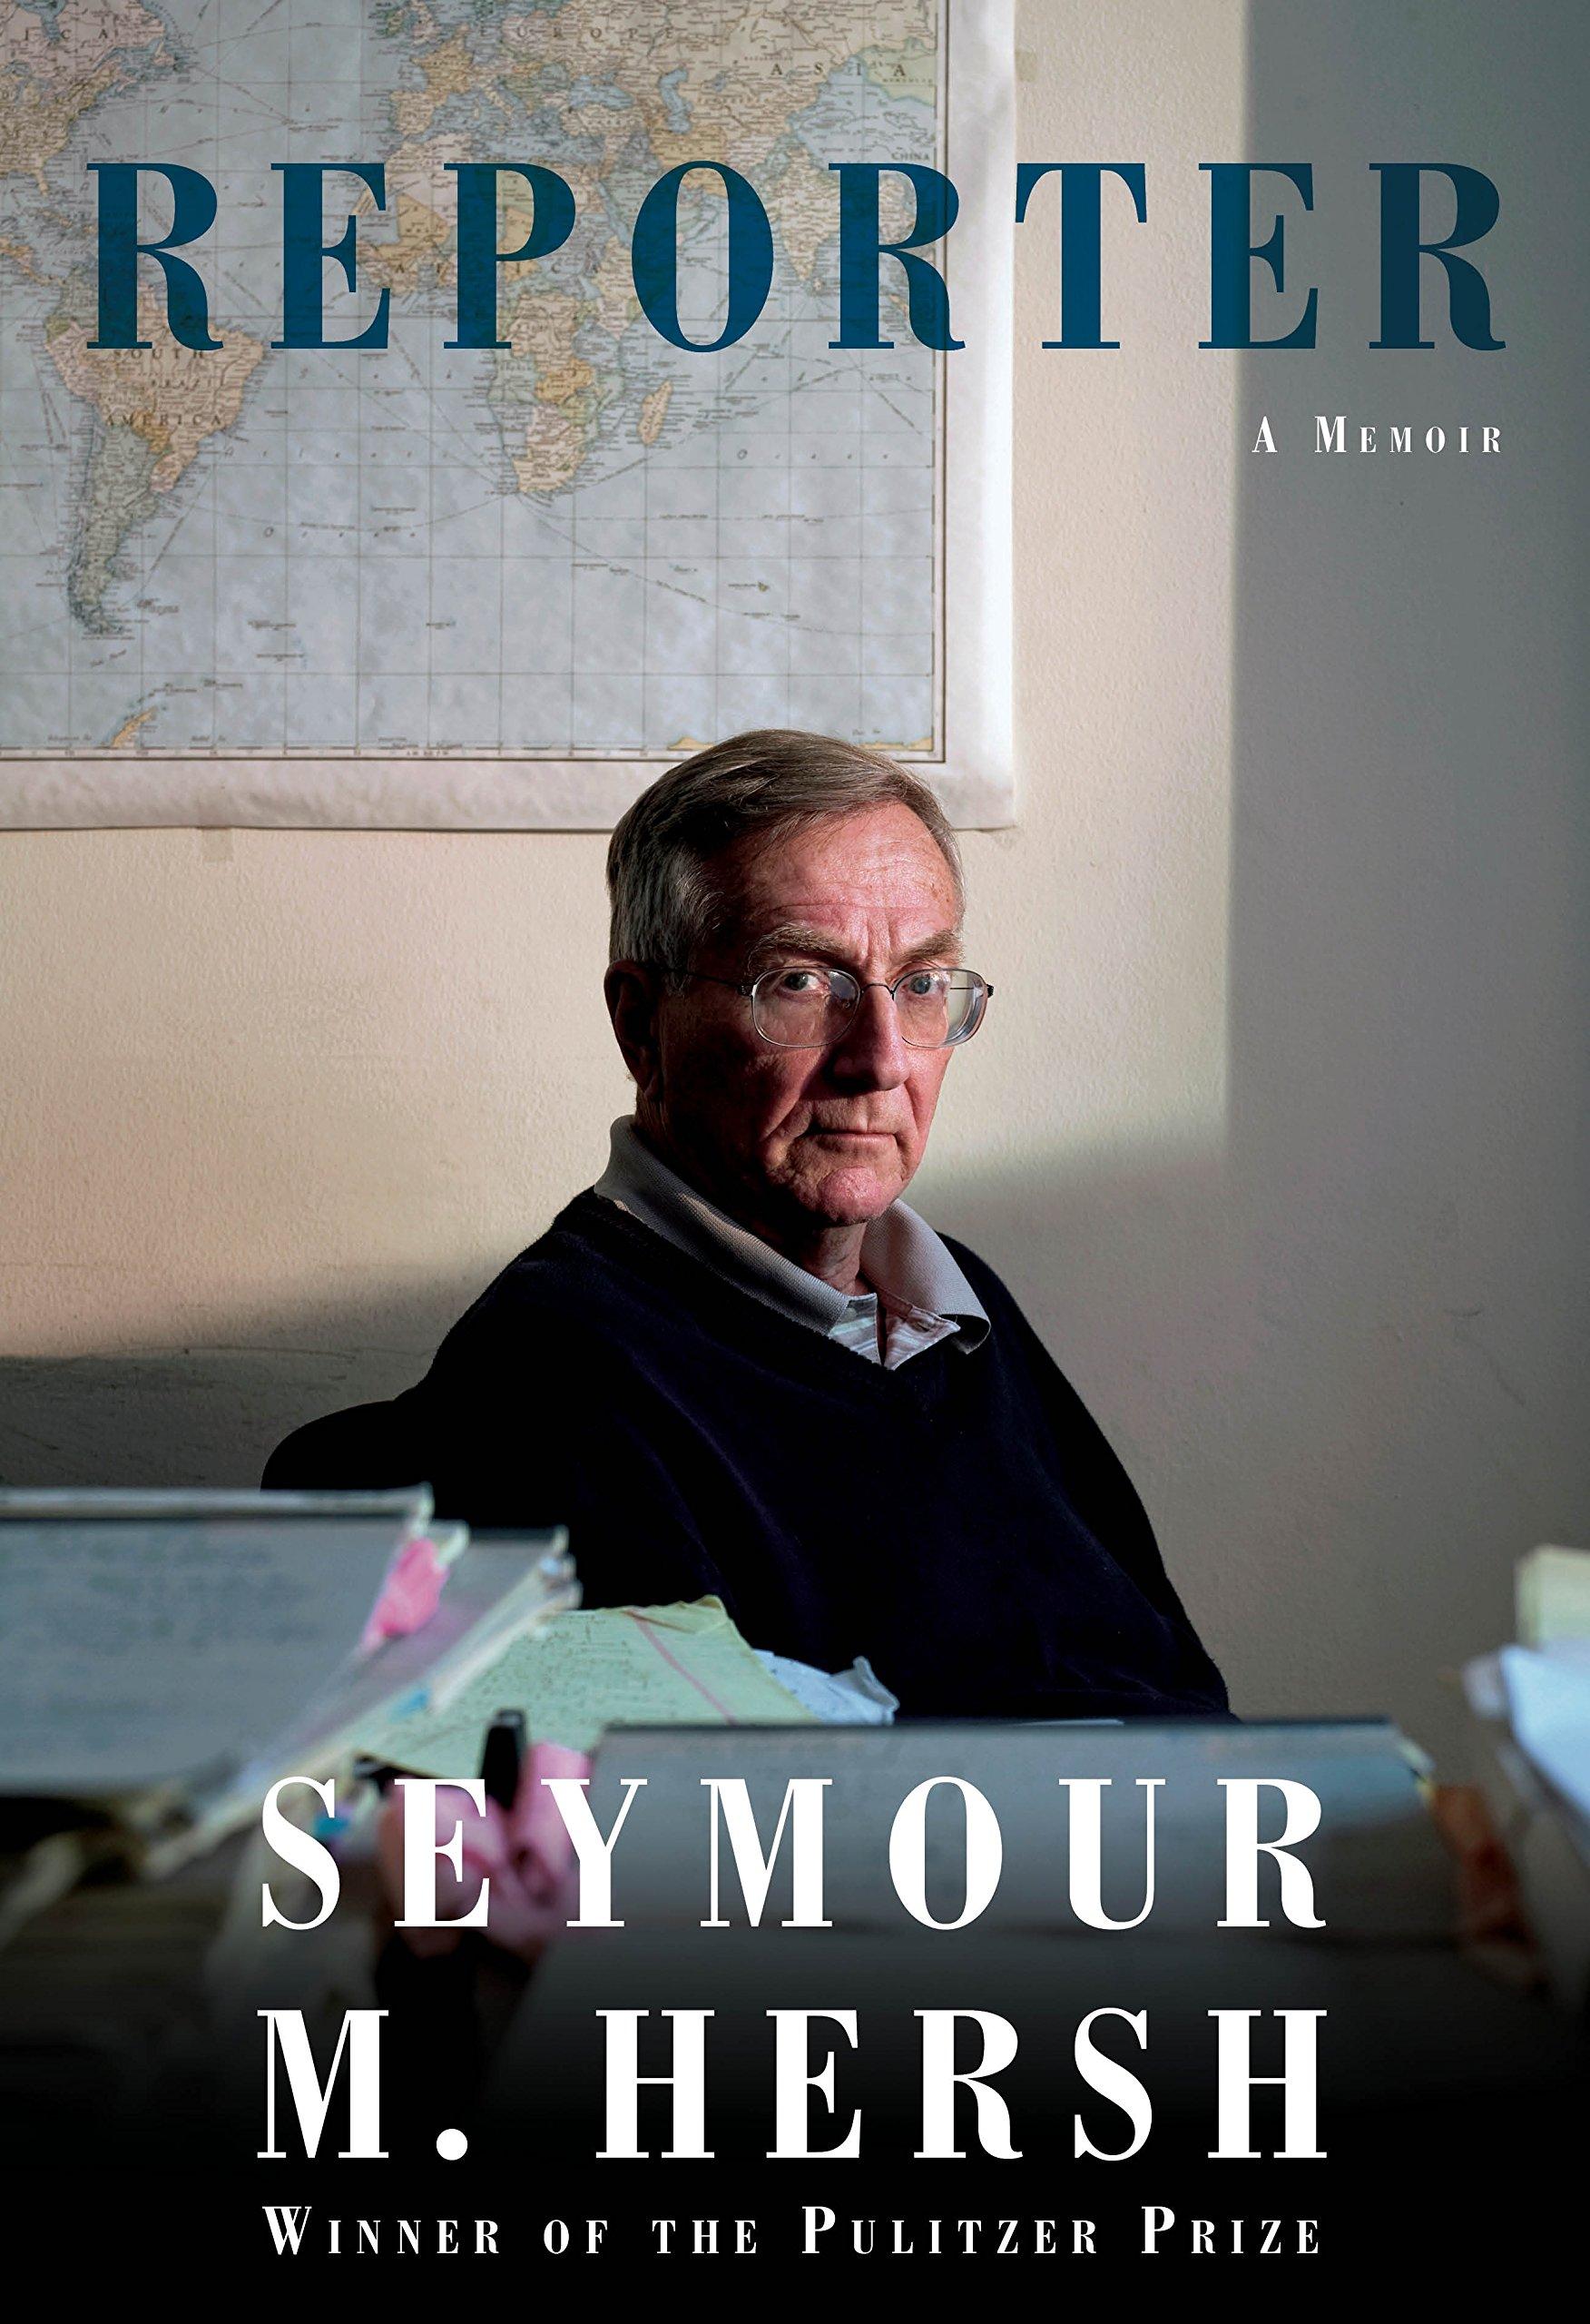 Reporter: A Memoir by Seymour M. Hersh